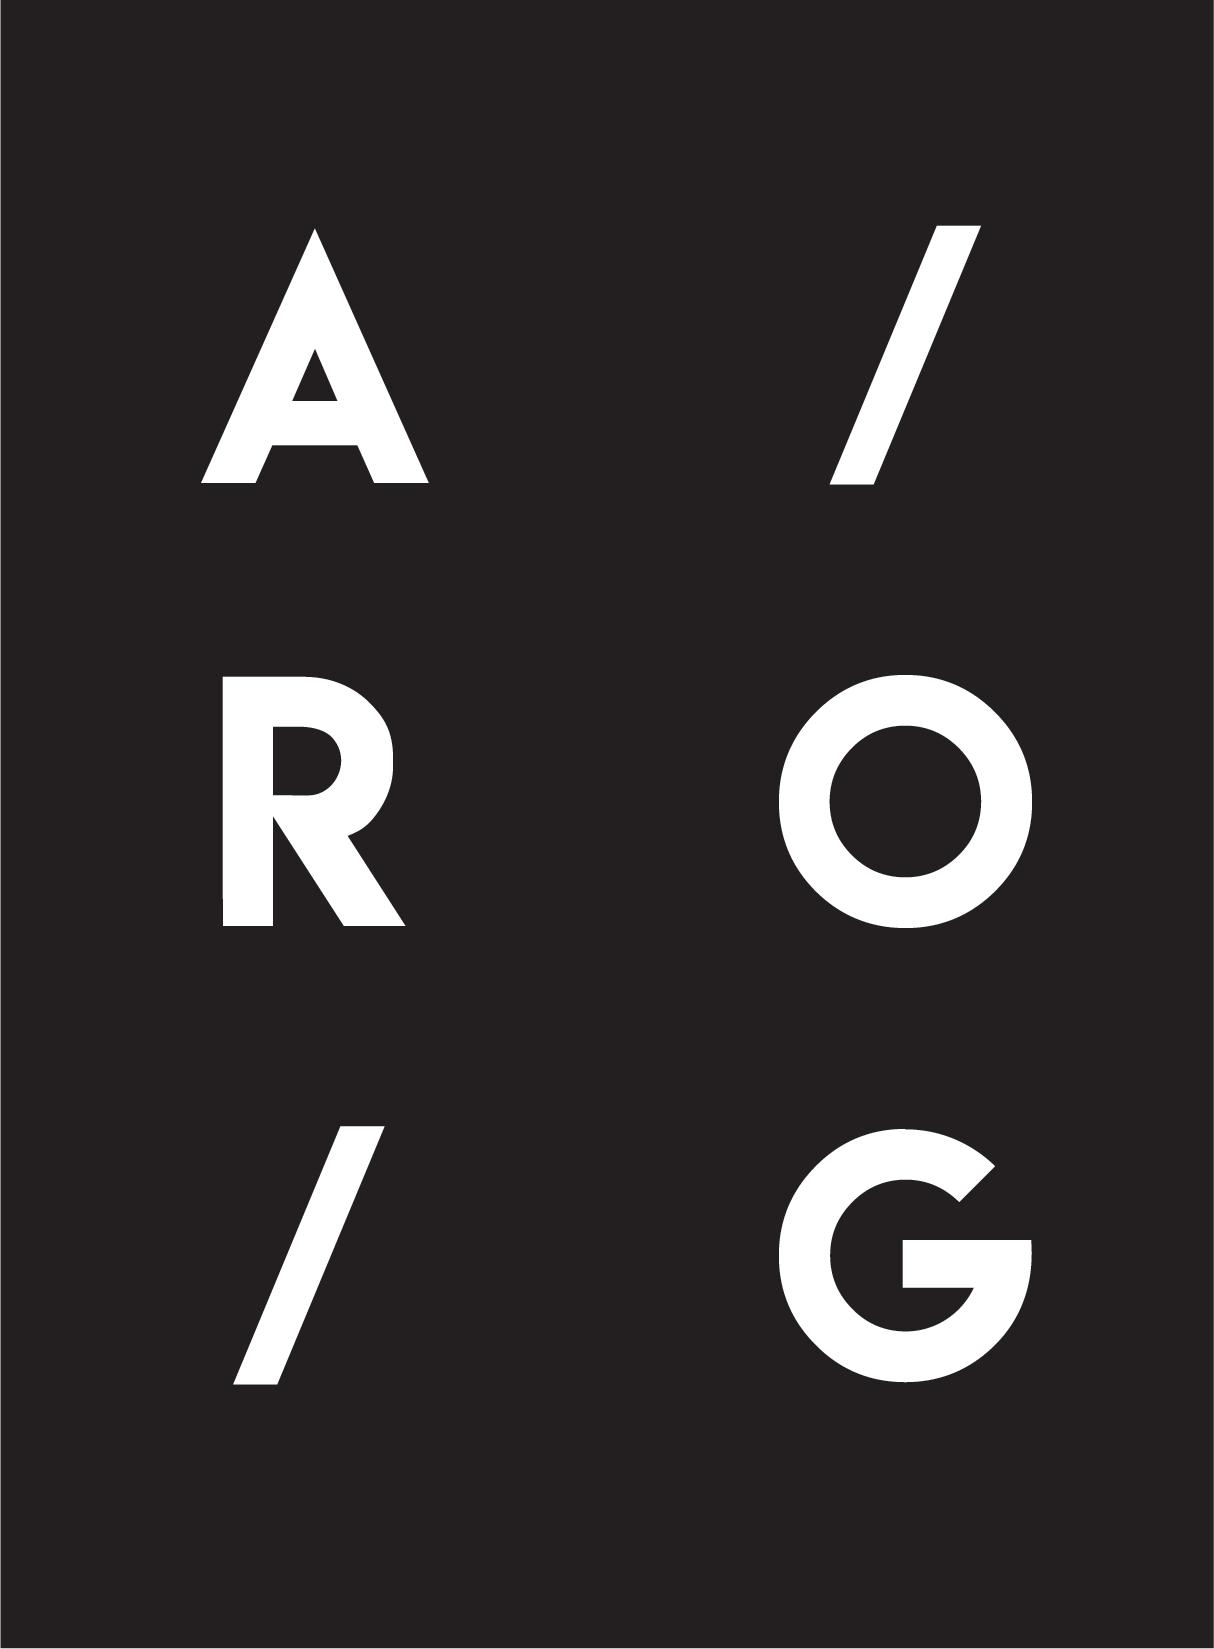 arogdesign_logo_CMYK_mono.png